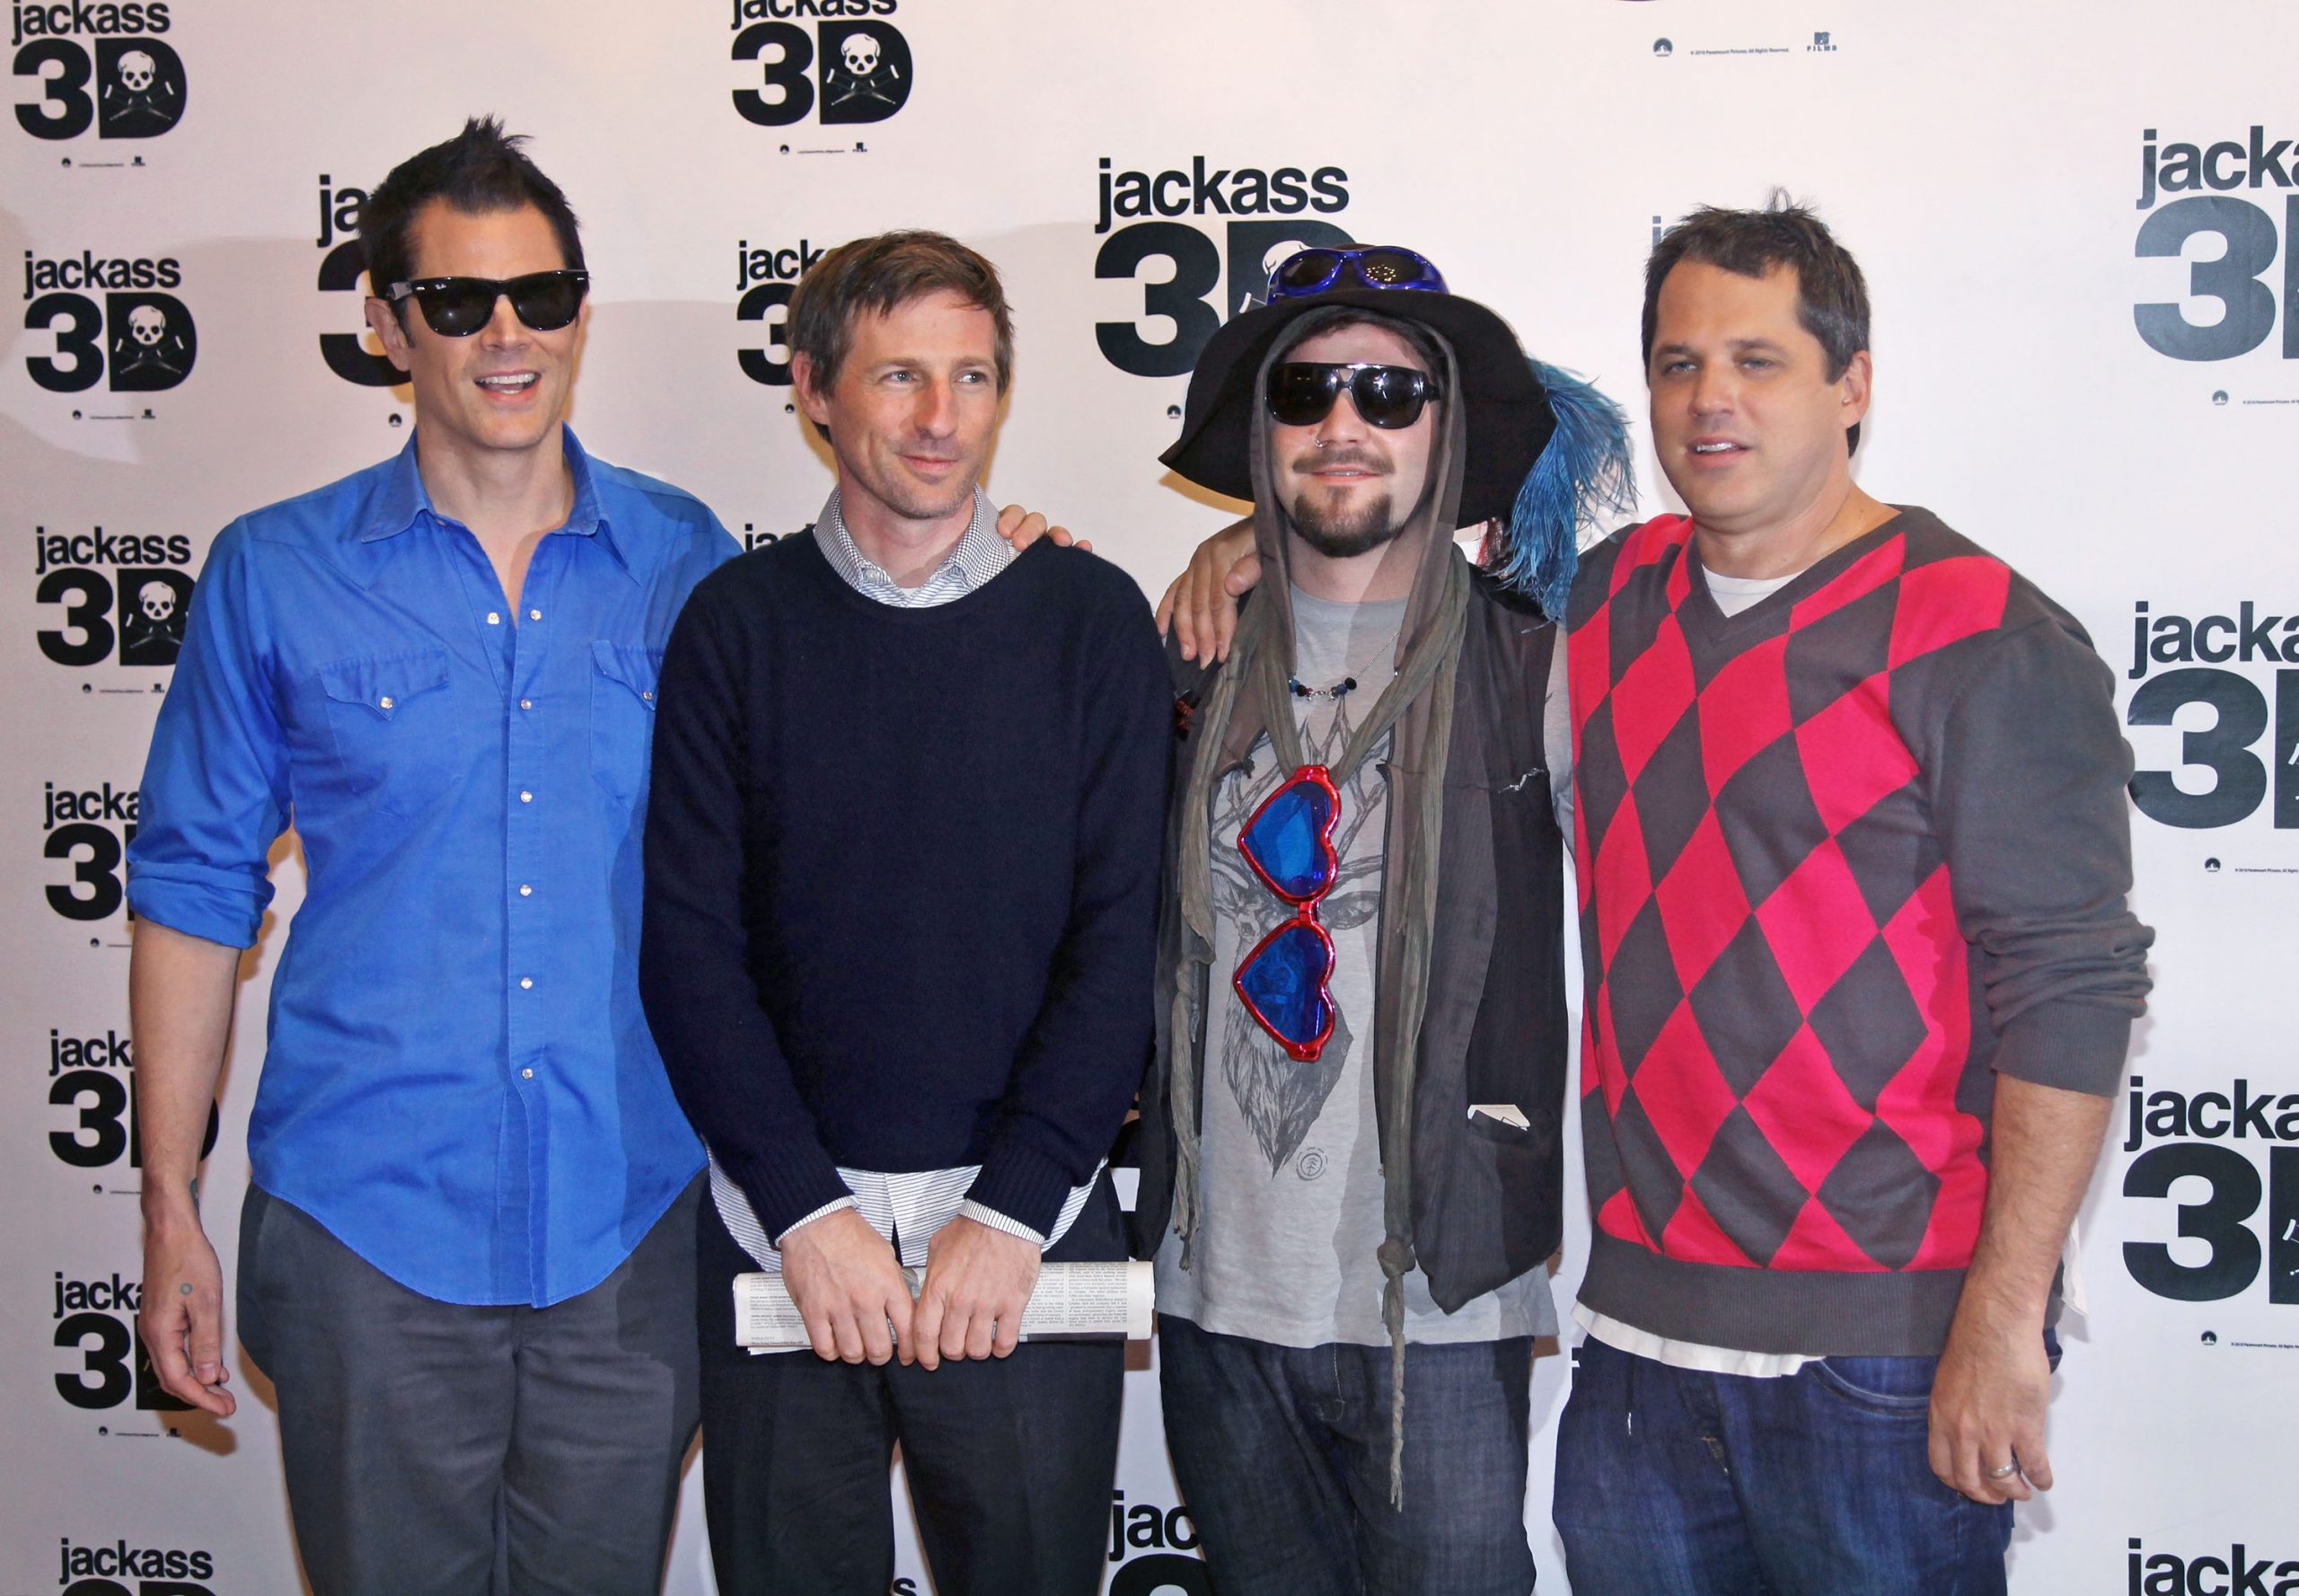 Bam Margera demanda a Paramount y Johnny Knoxville por despedirlo de 'Jackass'